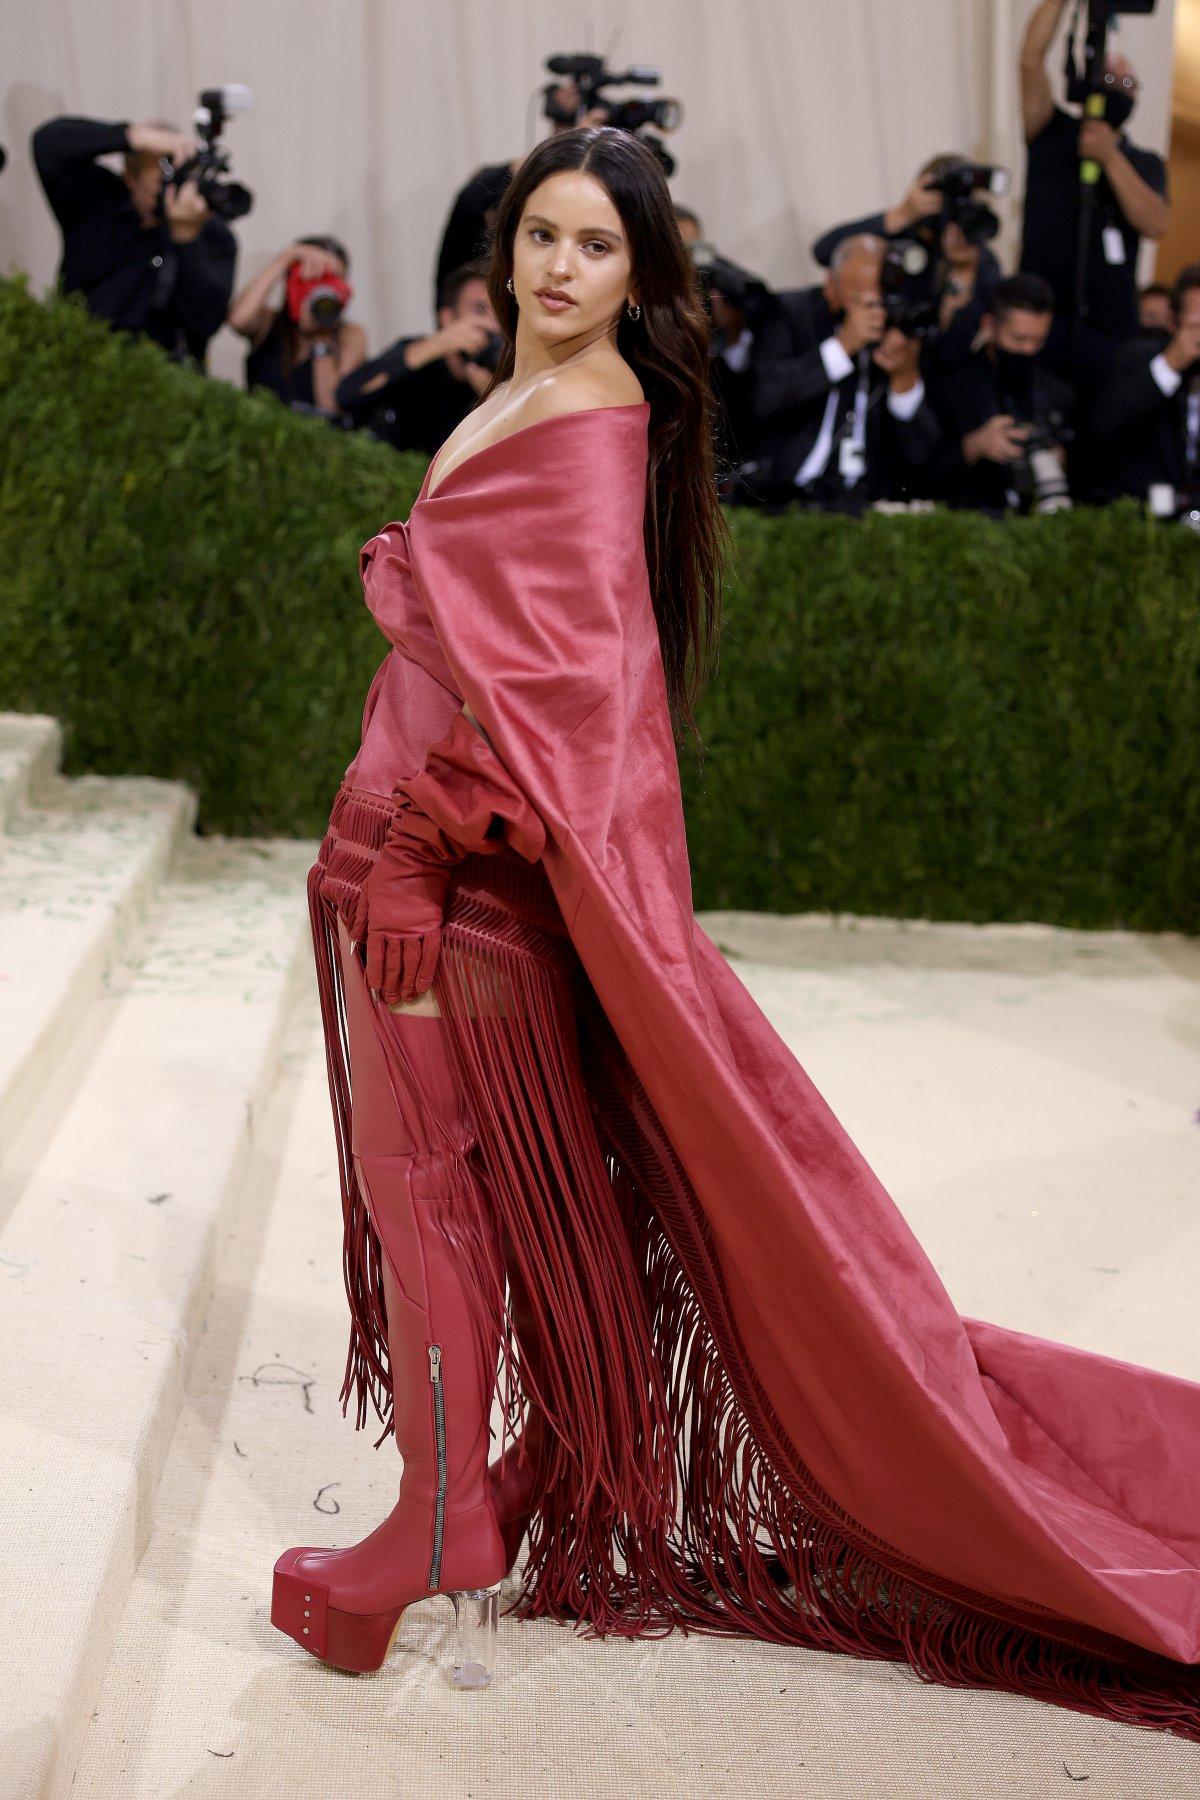 Rosalía, at the MET 2021 gala